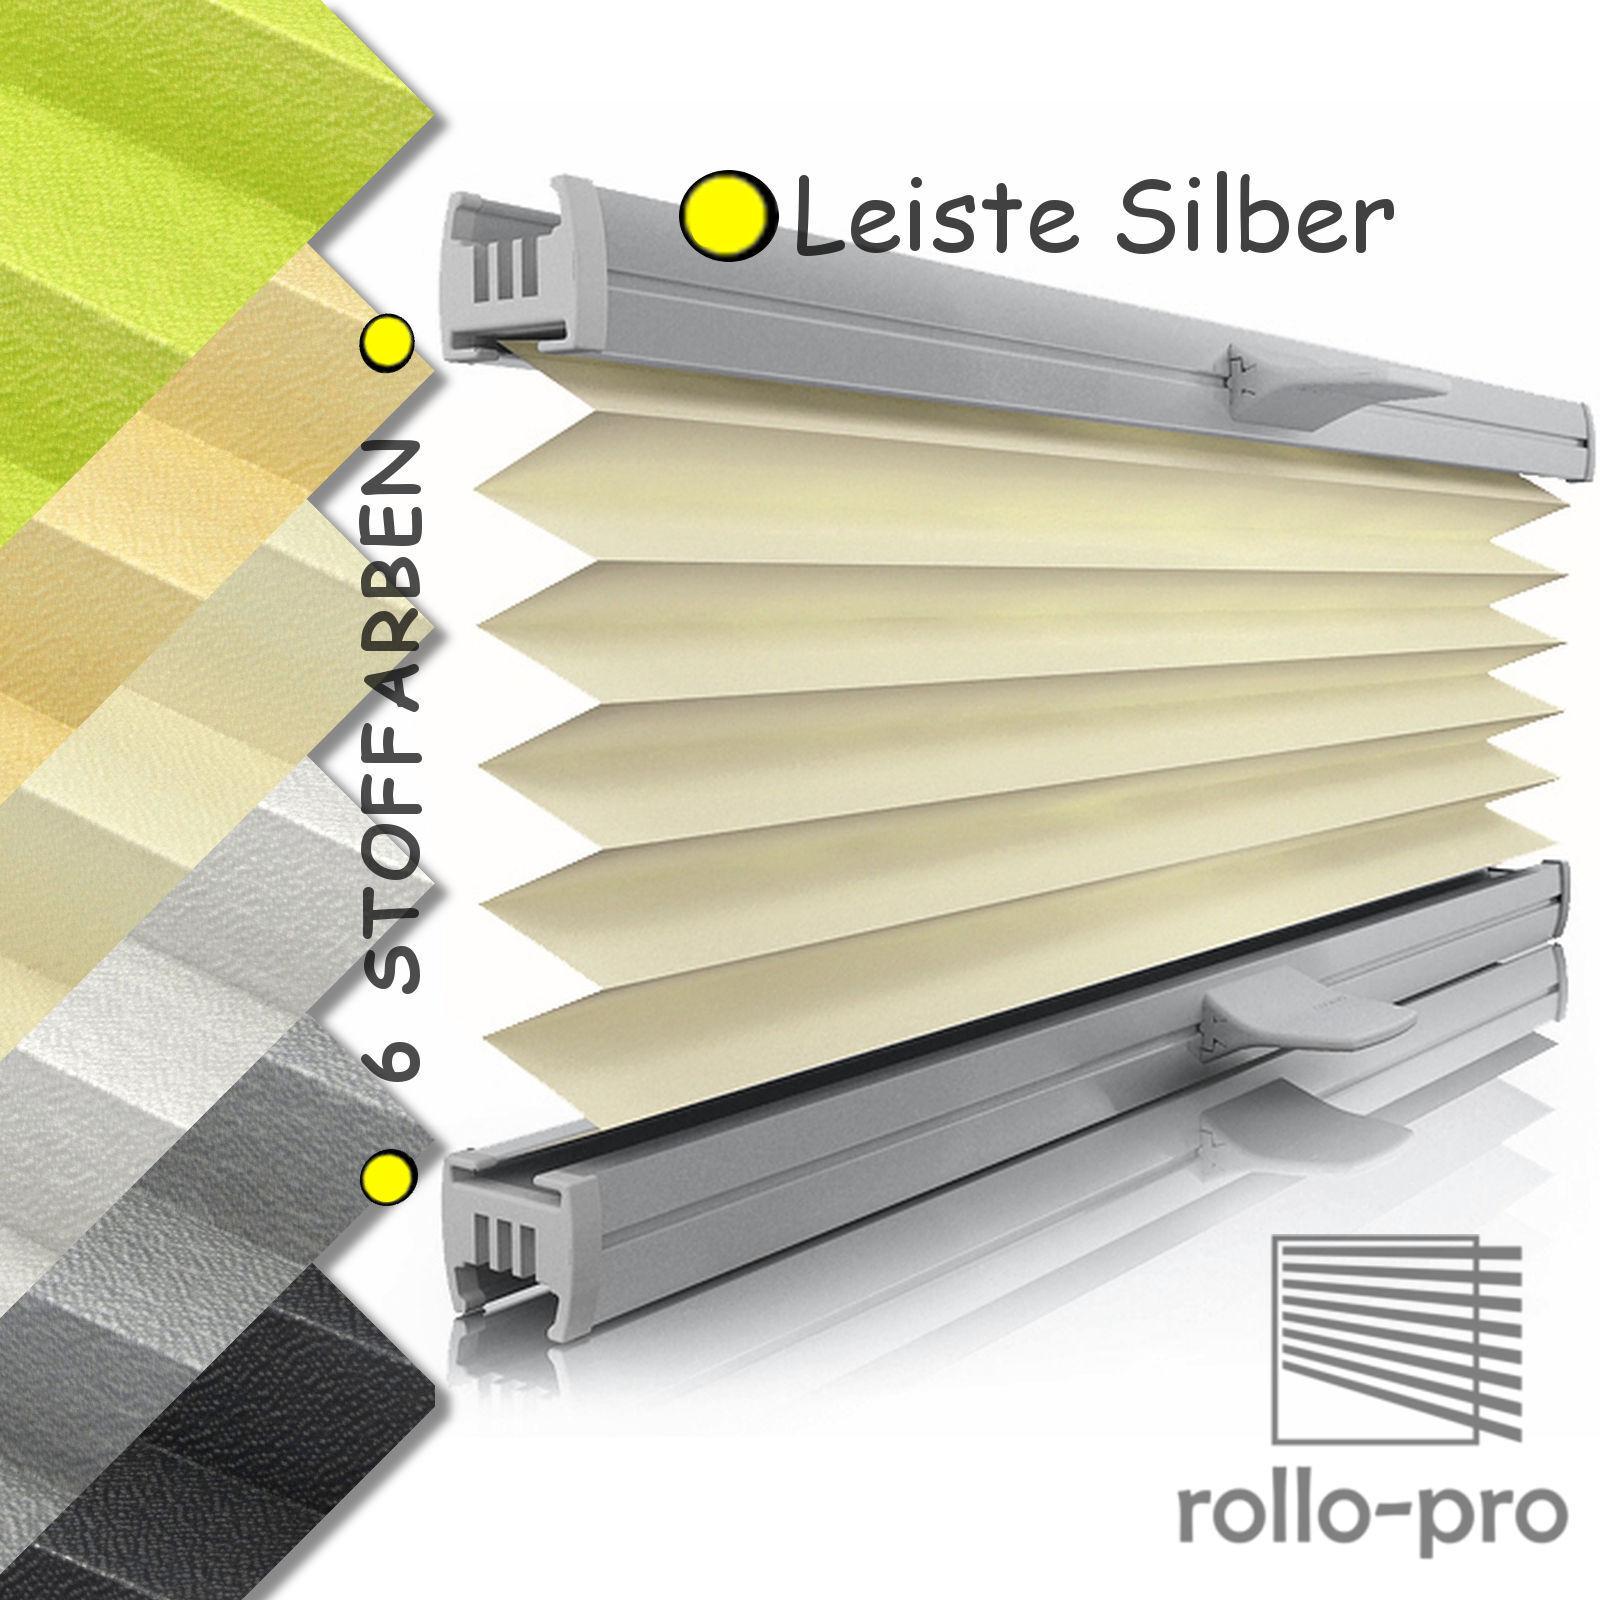 Plissee Faltrollo nach Maß Plissee OFFICE Profil Silber ▻Rollos ...